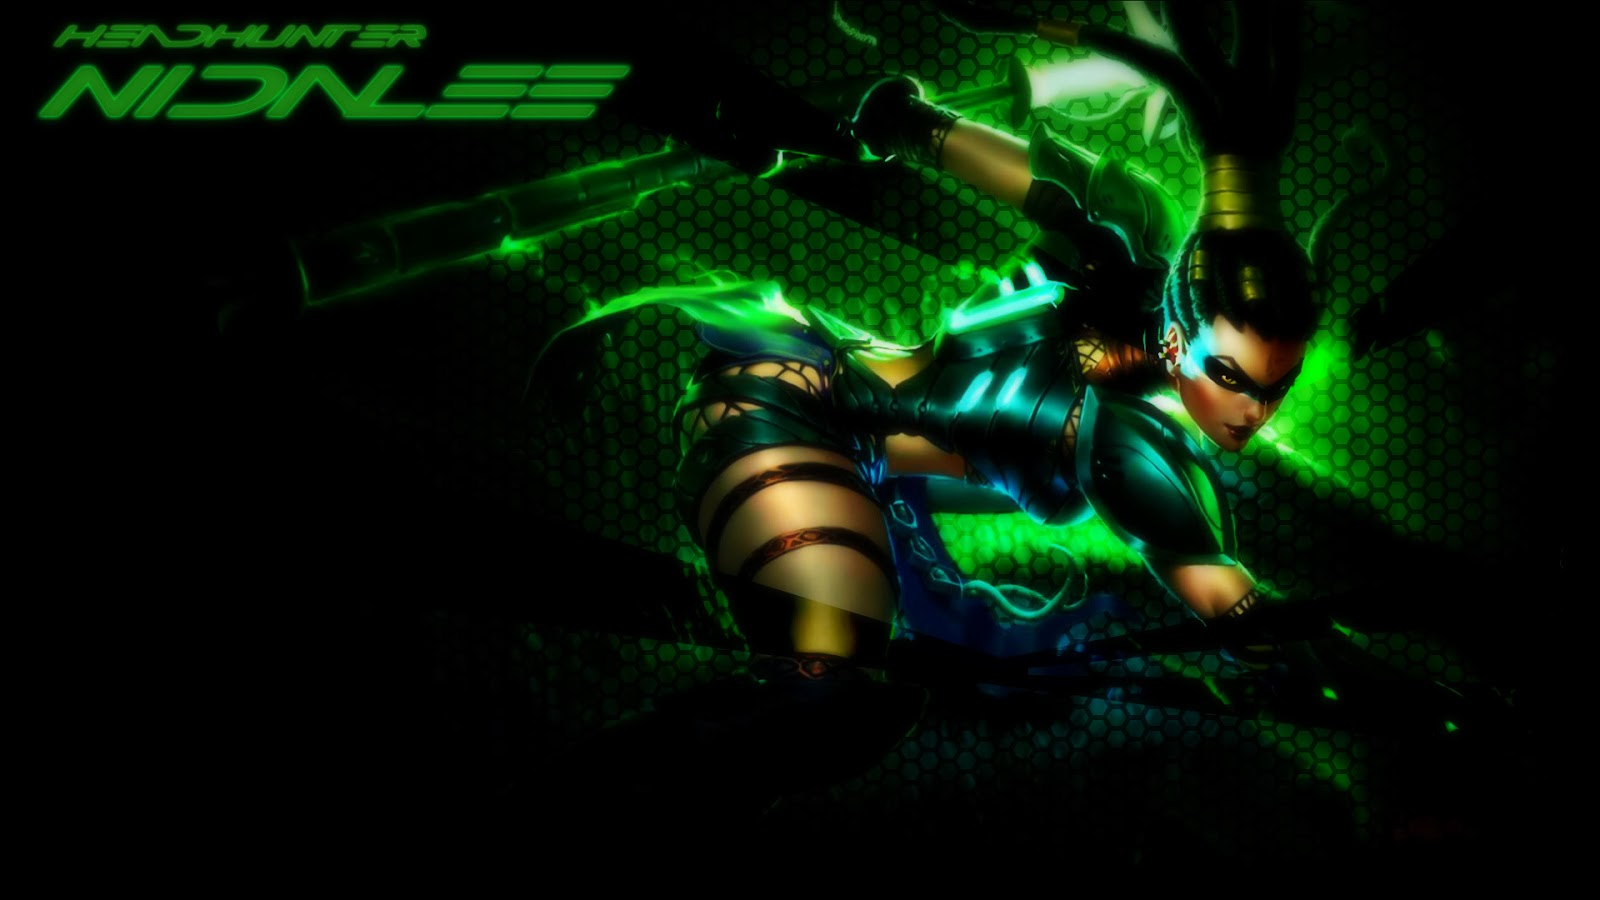 Nidalee League of Legends Wallpaper, Nidalee Desktop Wallpaper